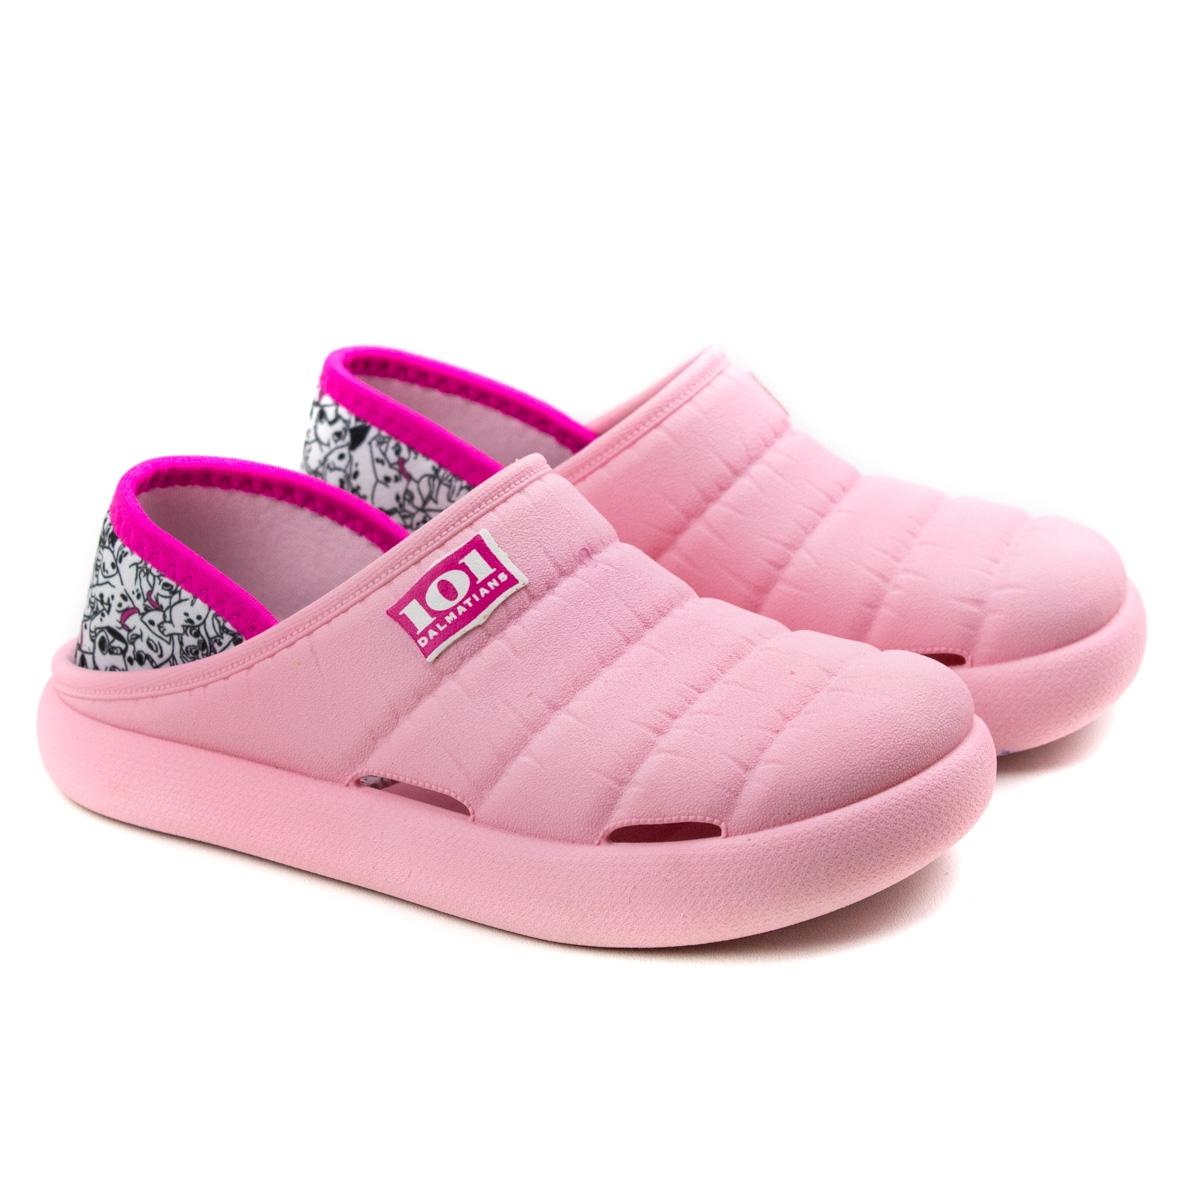 Babuche Disney Comfy Sneak Infantil Unissex - Rosa/branco